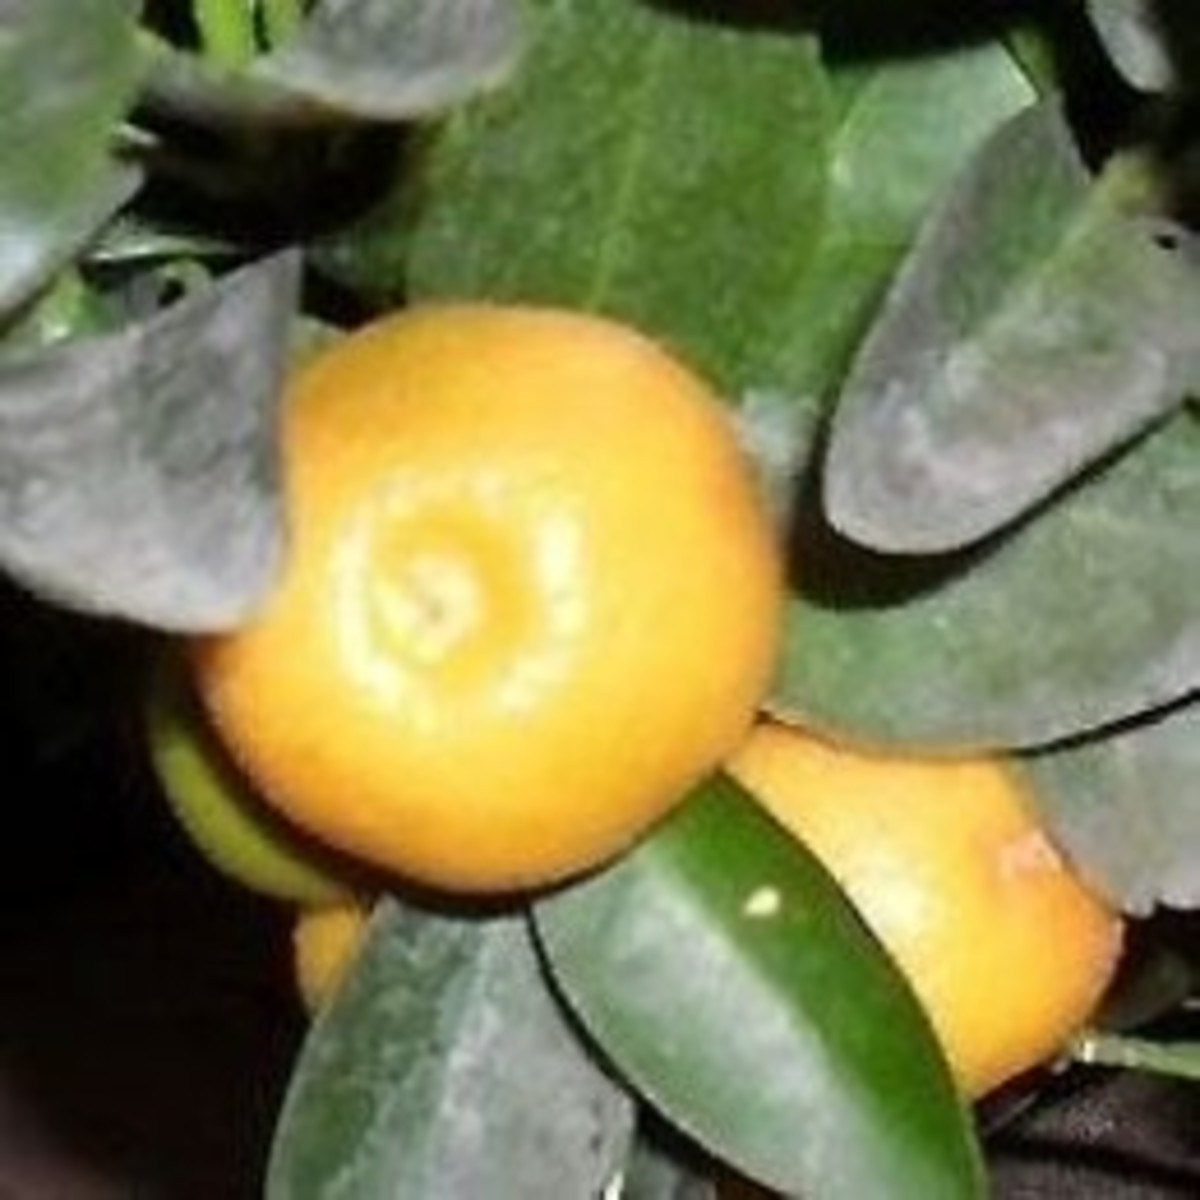 Calamondin Recipes - the sour orange in cooking